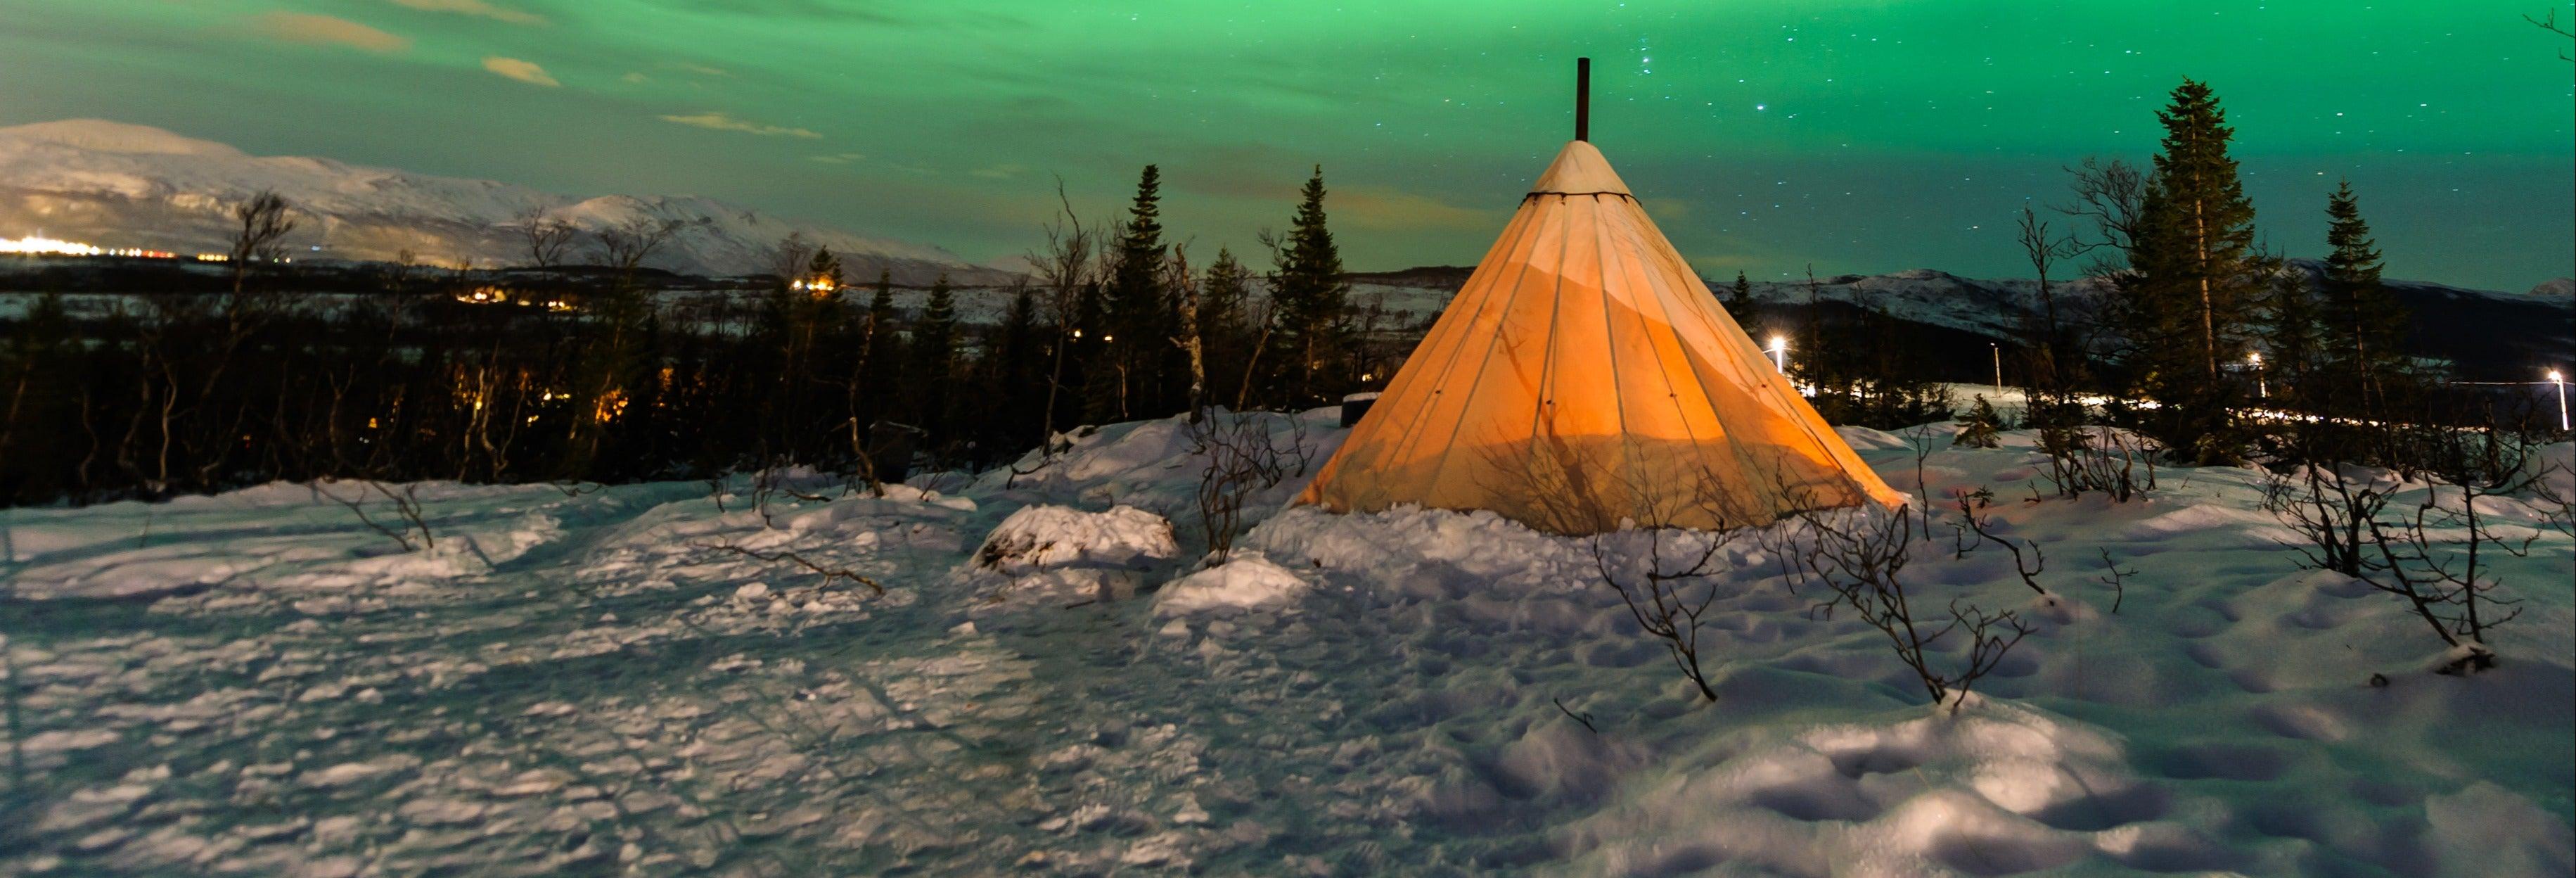 Lavvu Camping & Reindeer Sledding